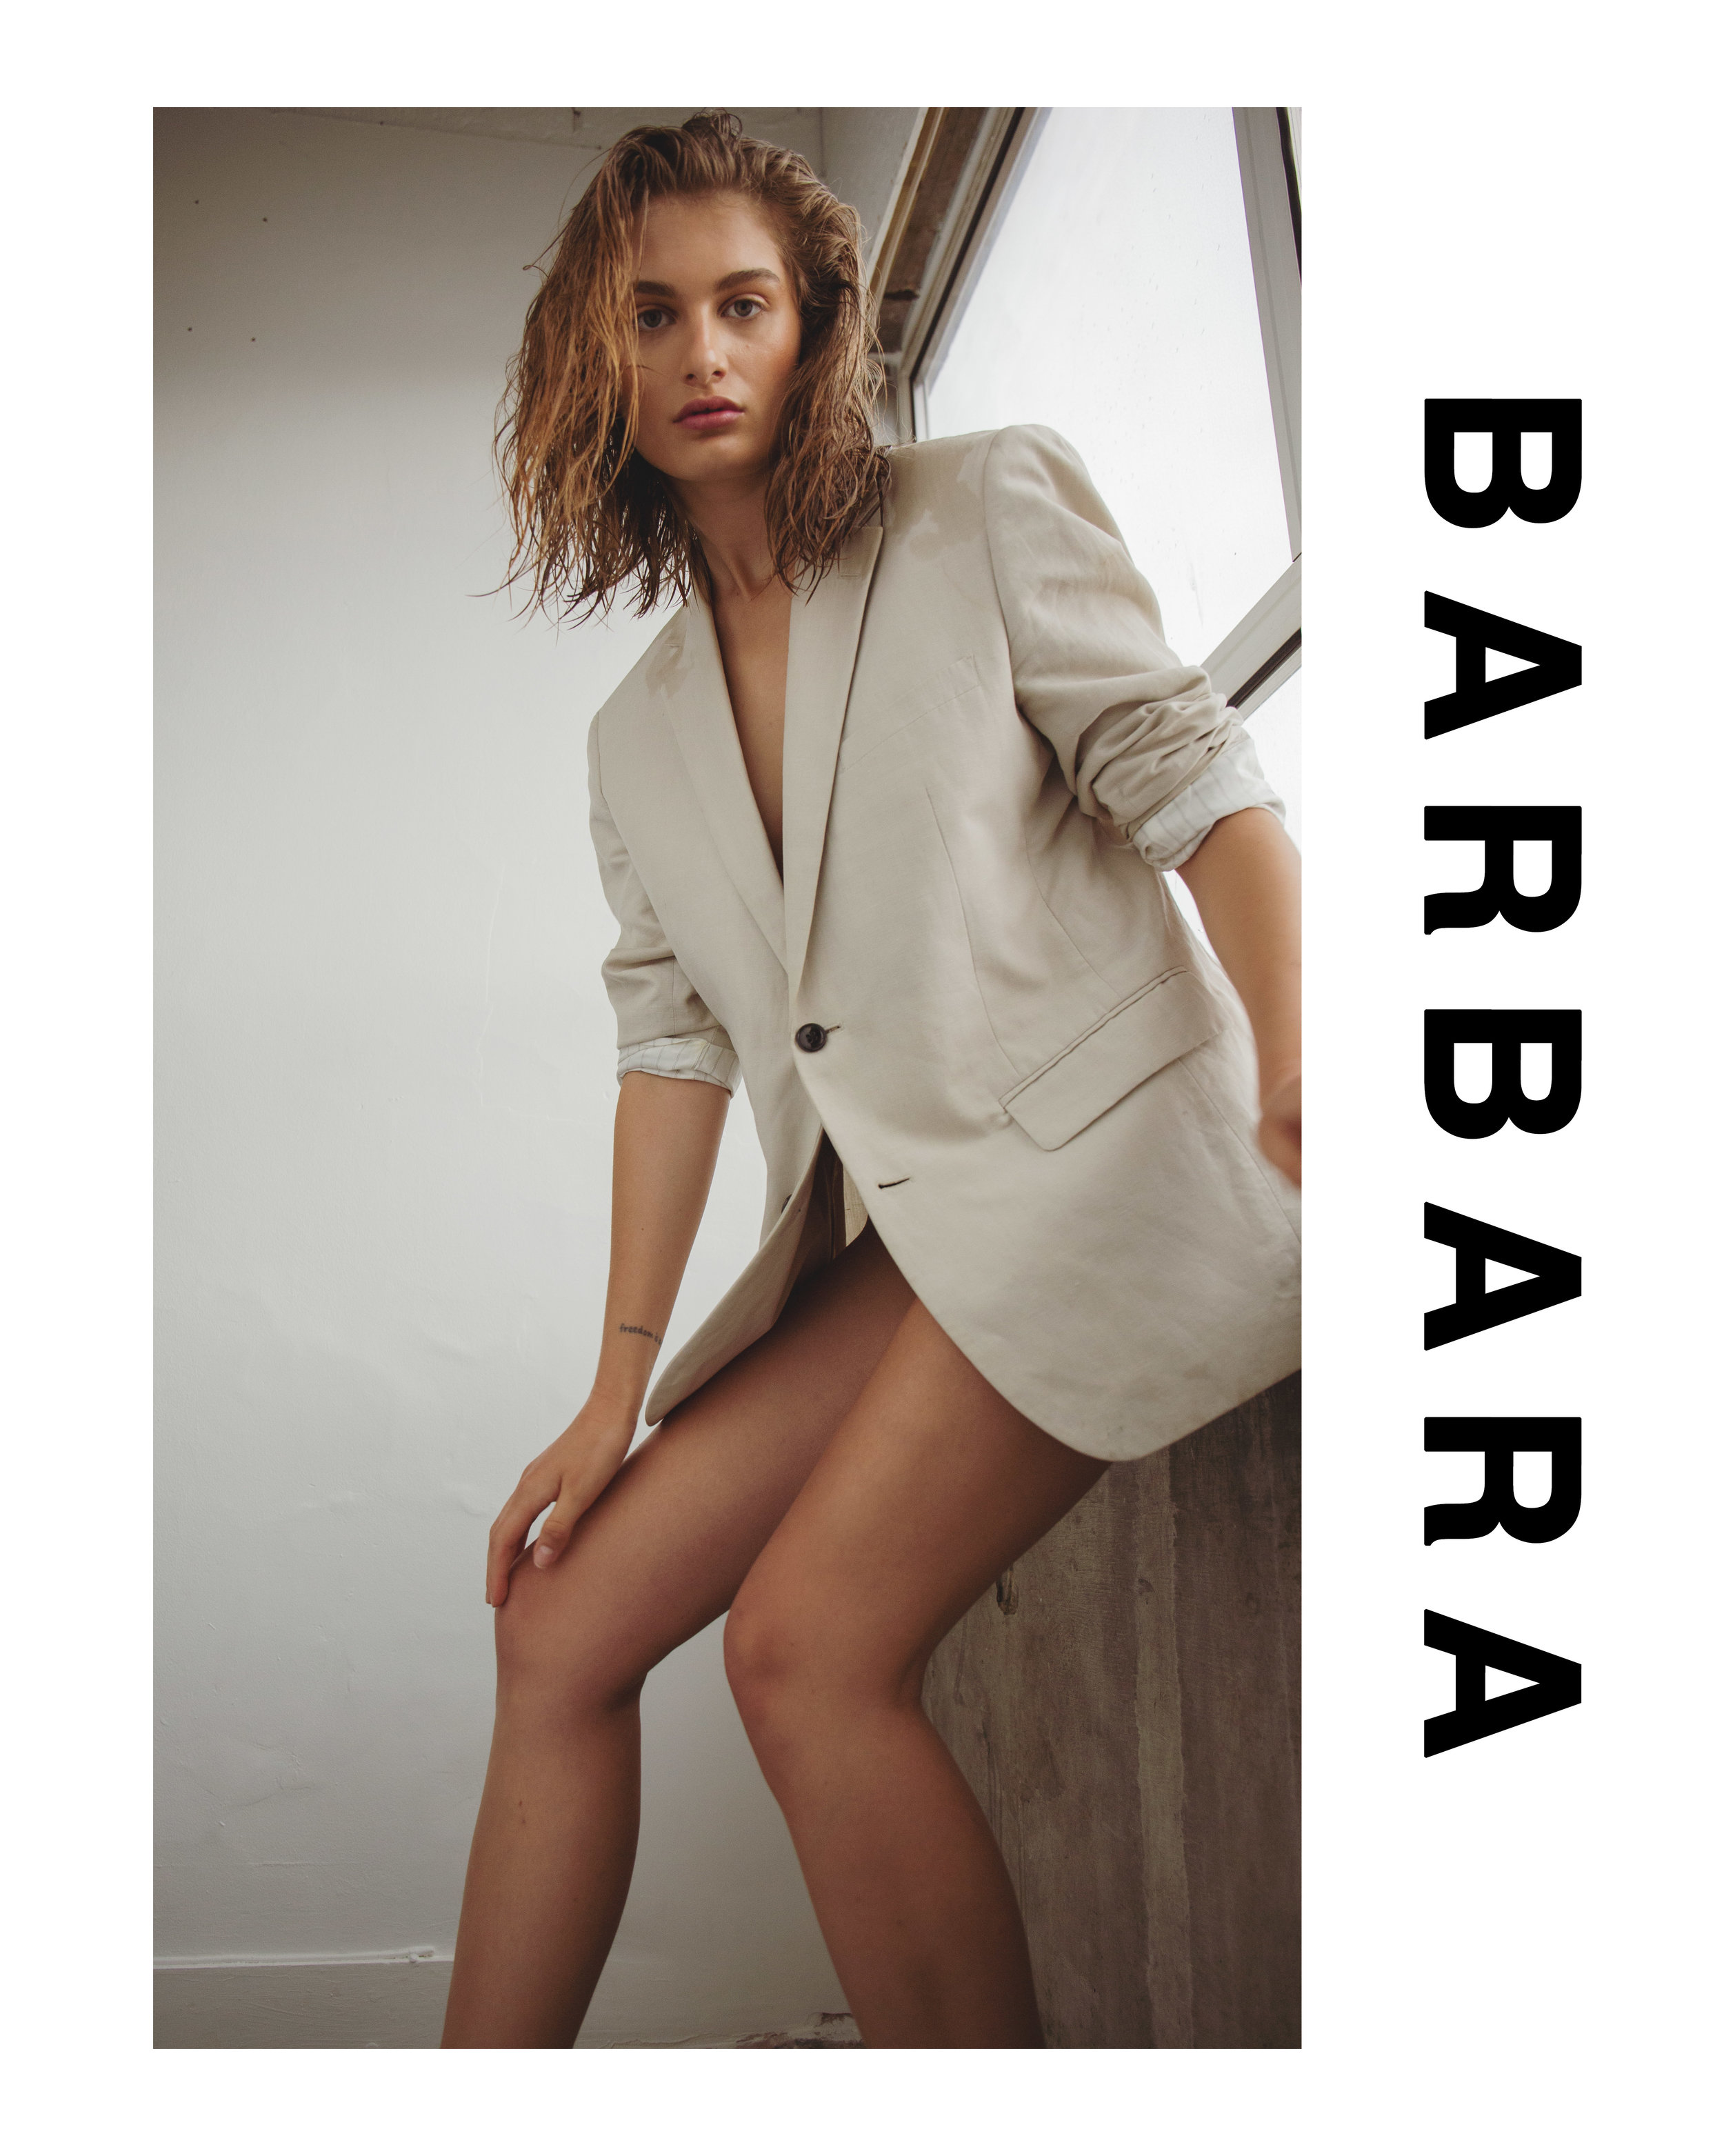 barb-5.jpg